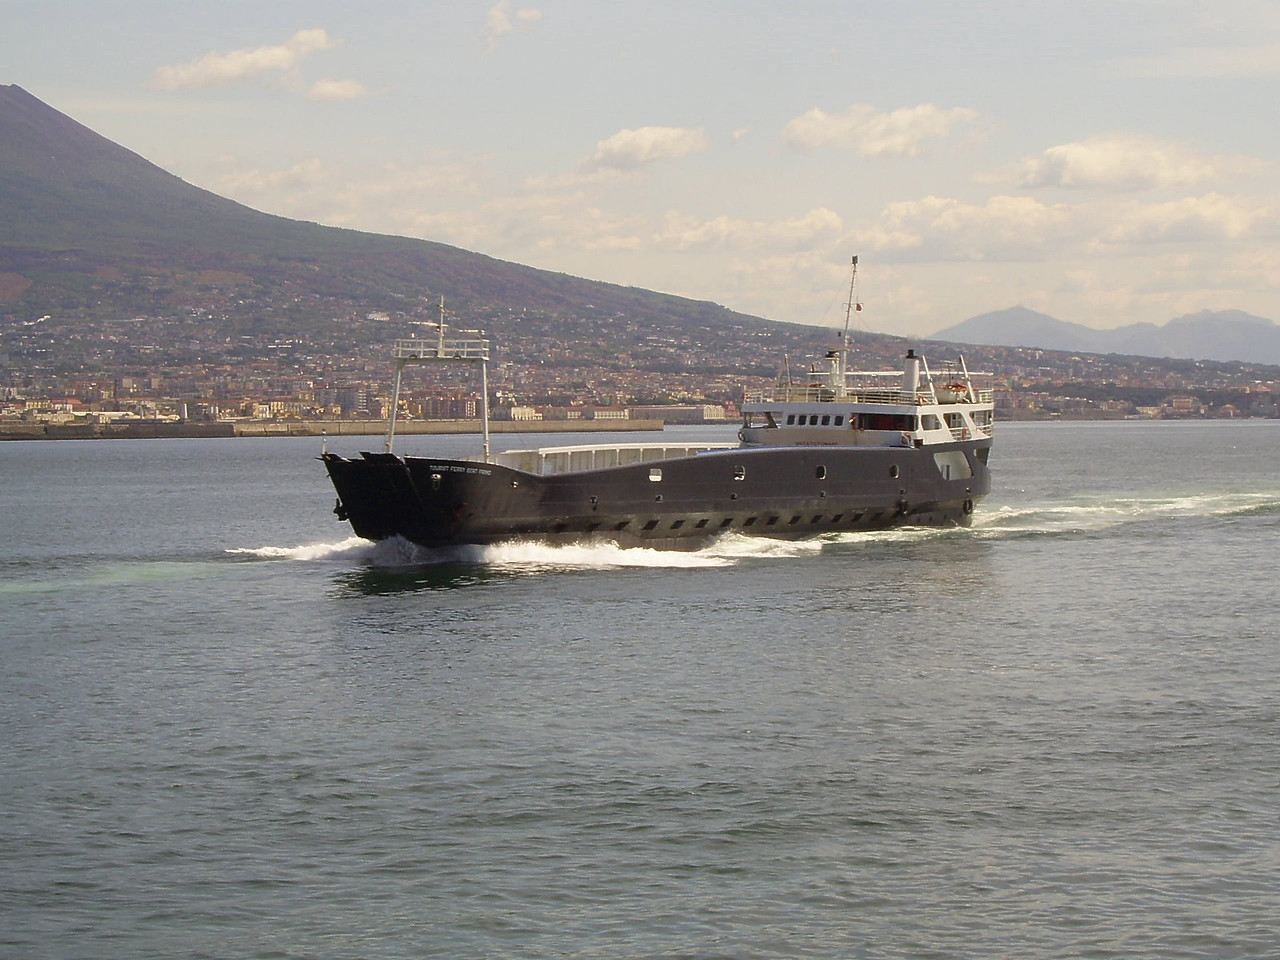 2007 - TOURIST FERRY BOAT PRIMO arriving to Napoli.